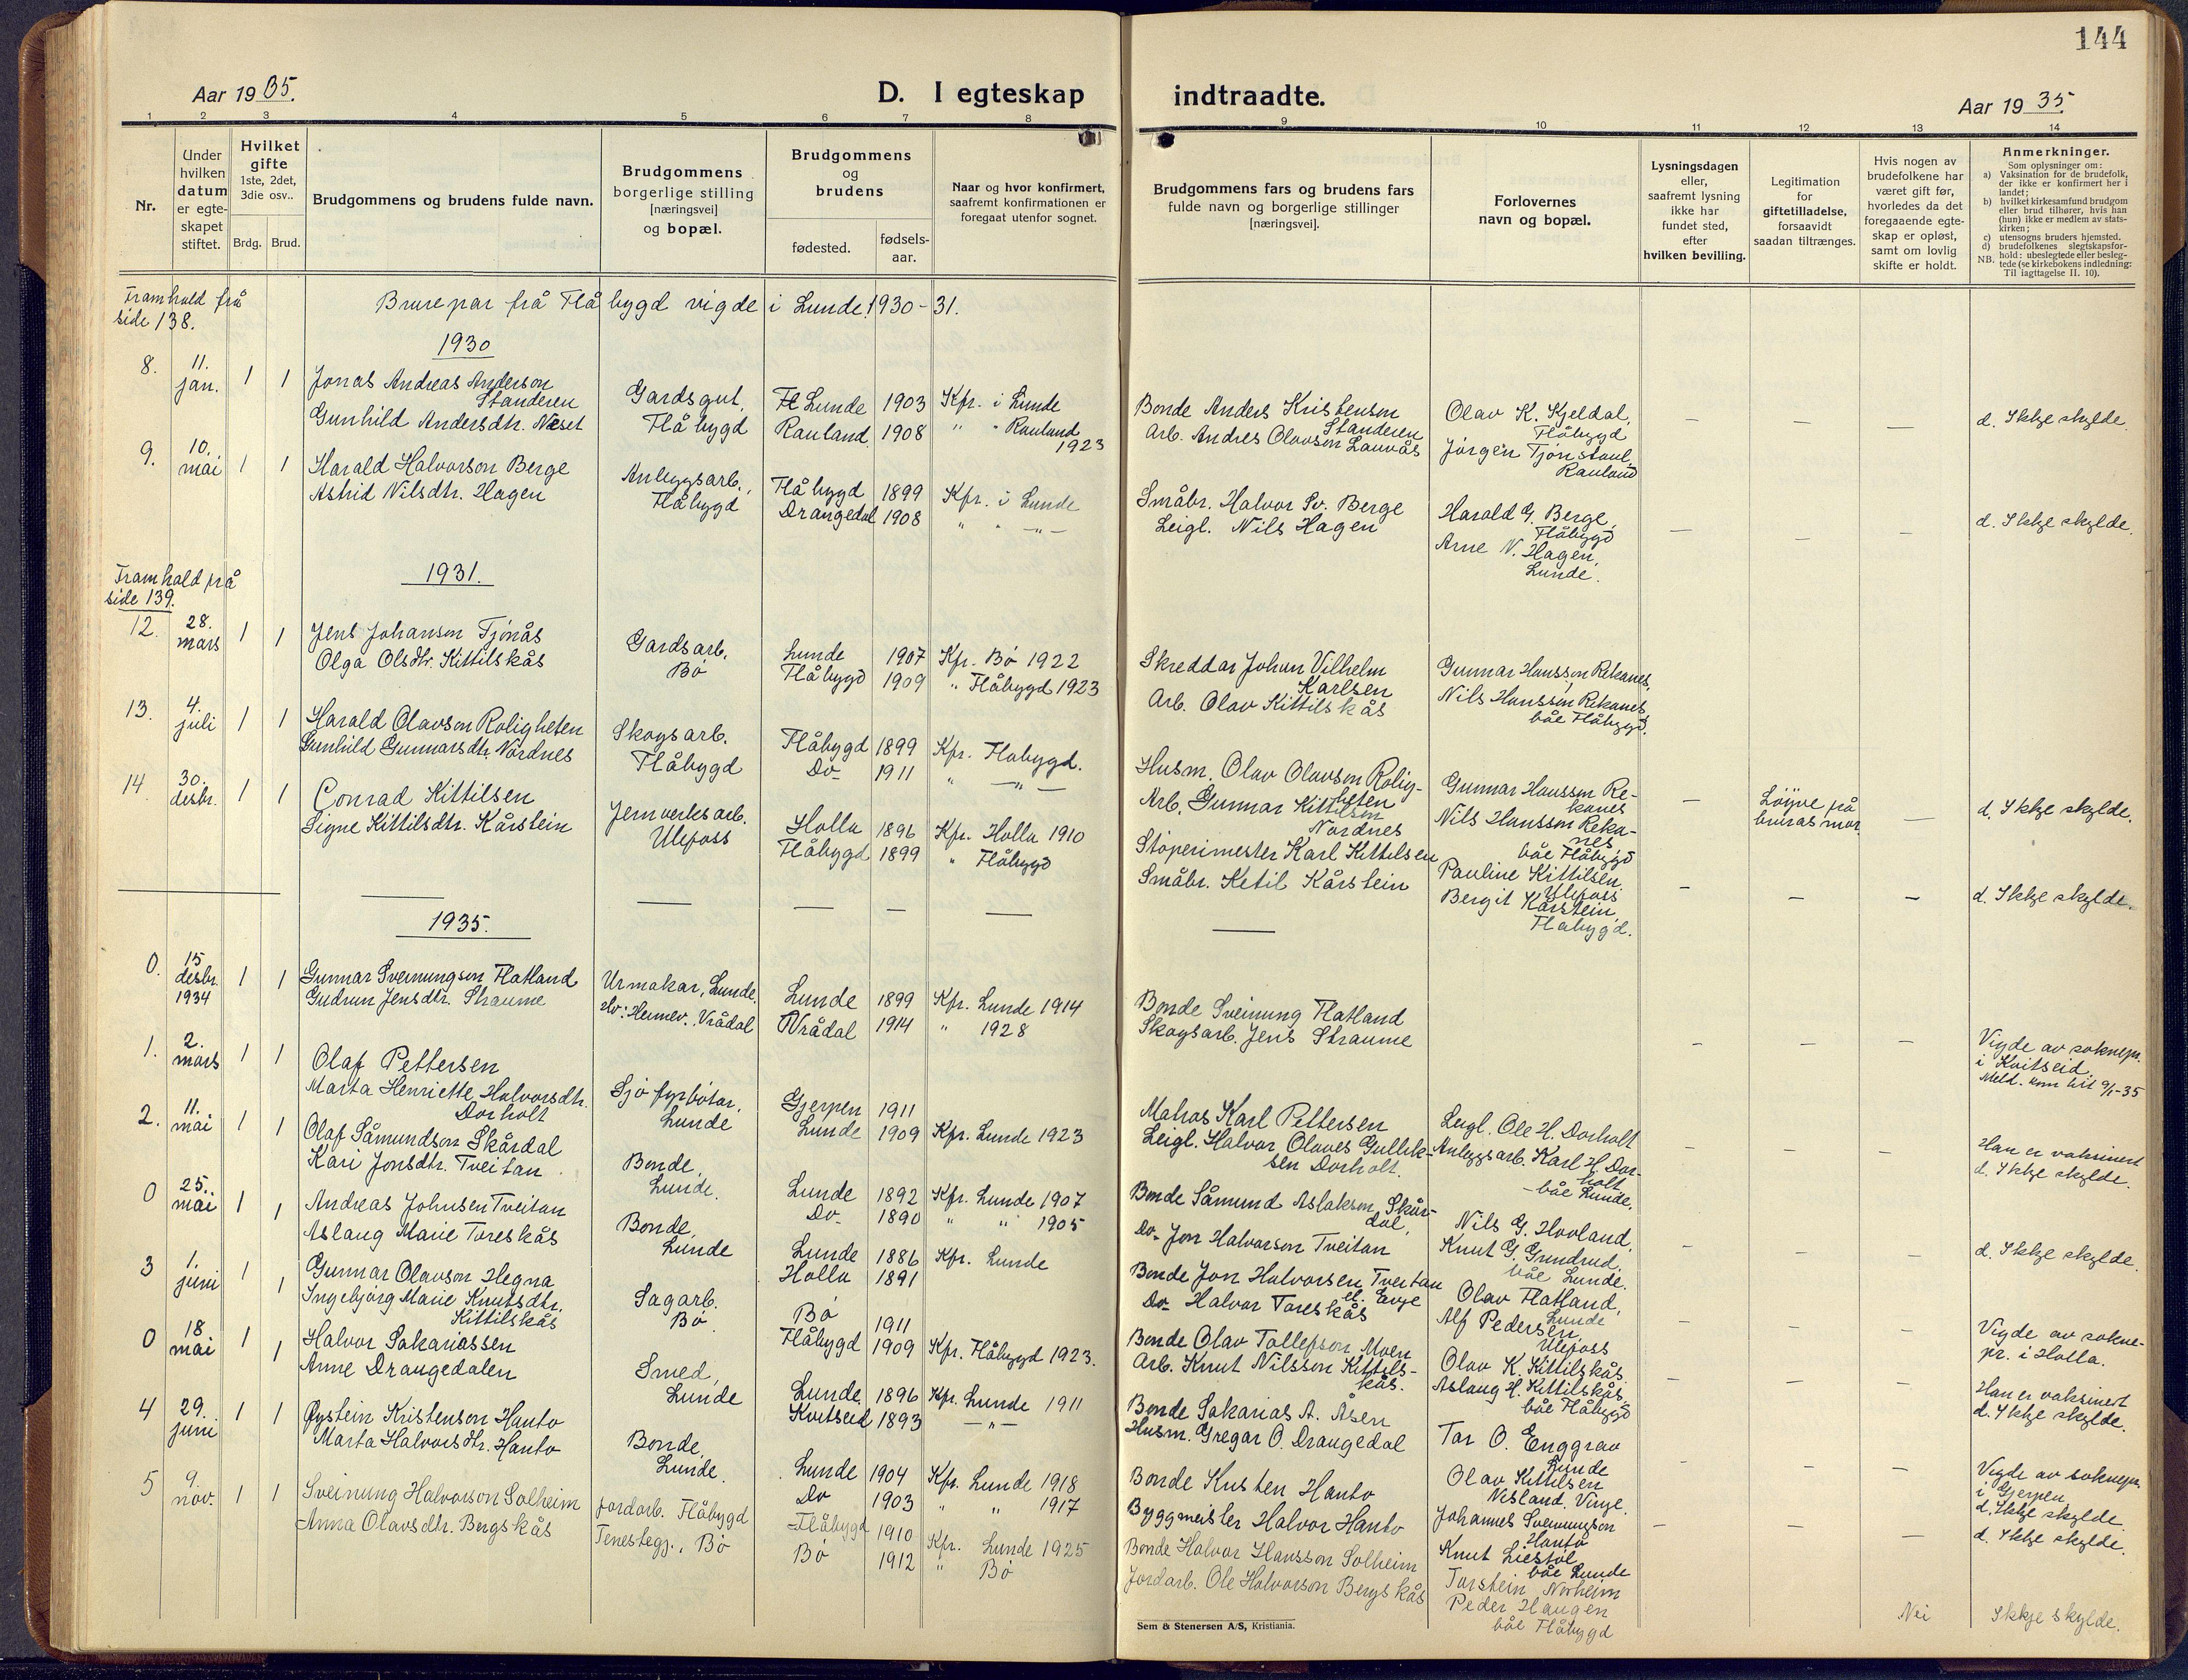 SAKO, Lunde kirkebøker, F/Fa/L0006: Ministerialbok nr. I 6, 1922-1940, s. 144